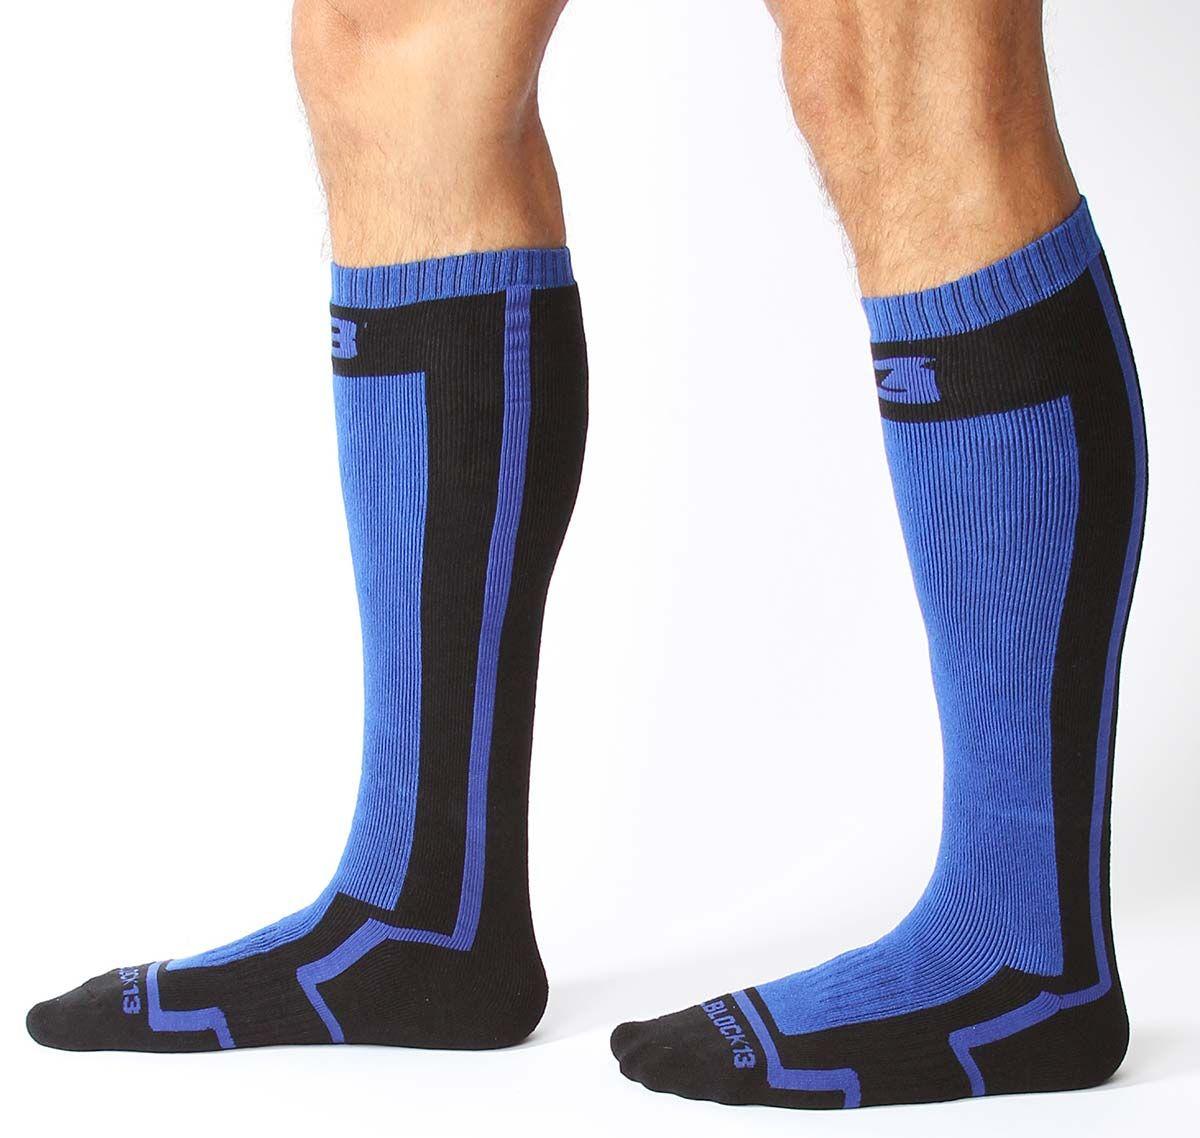 Cellblock 13 Calcetines deportivos FULL THROTTLE KNEE HIGH SOCK, azul